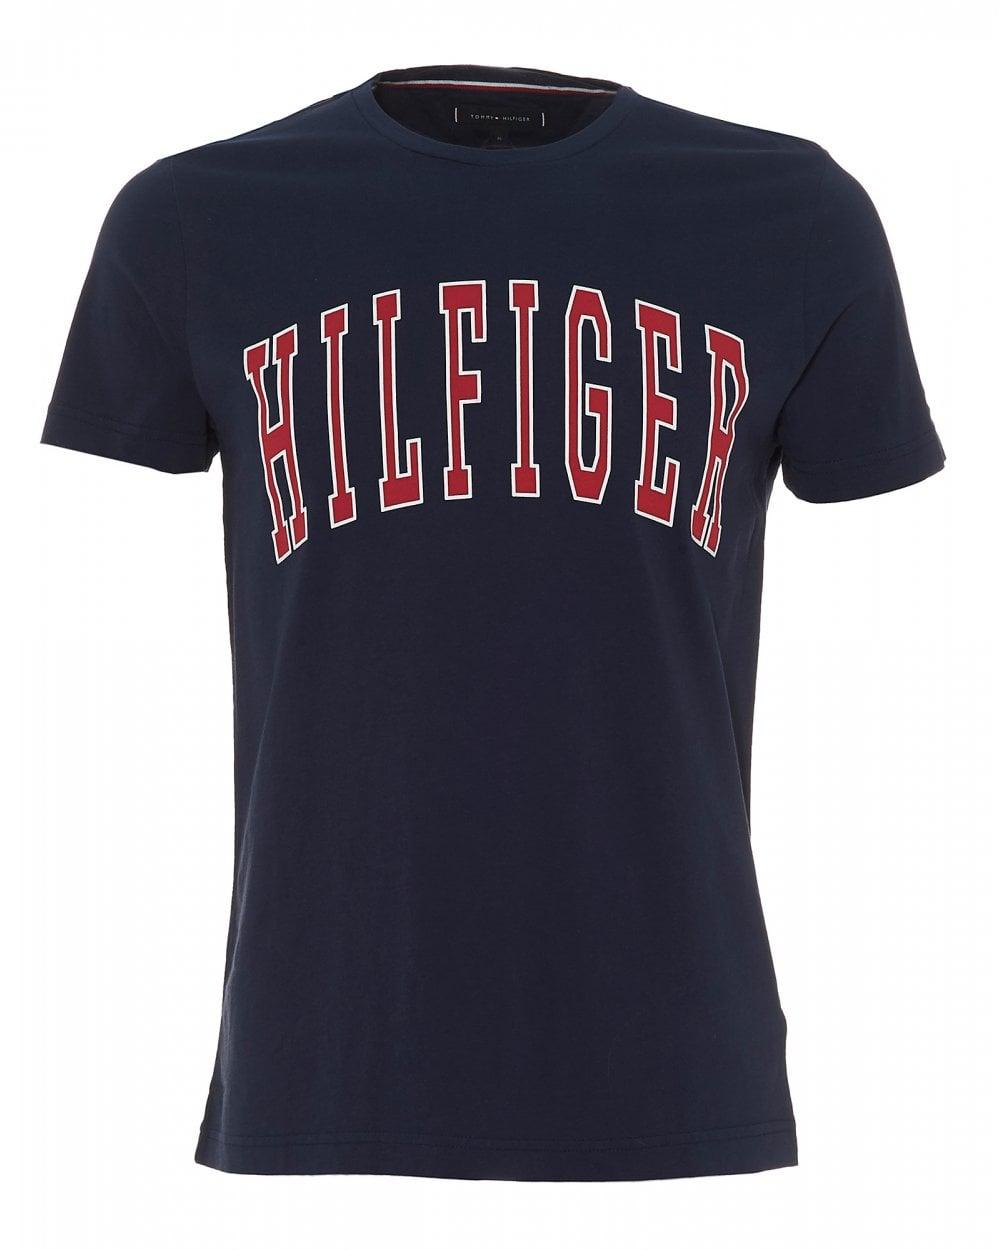 c0f94ac8ca846 Tommy Hilfiger Mens Retro College Logo T-Shirt